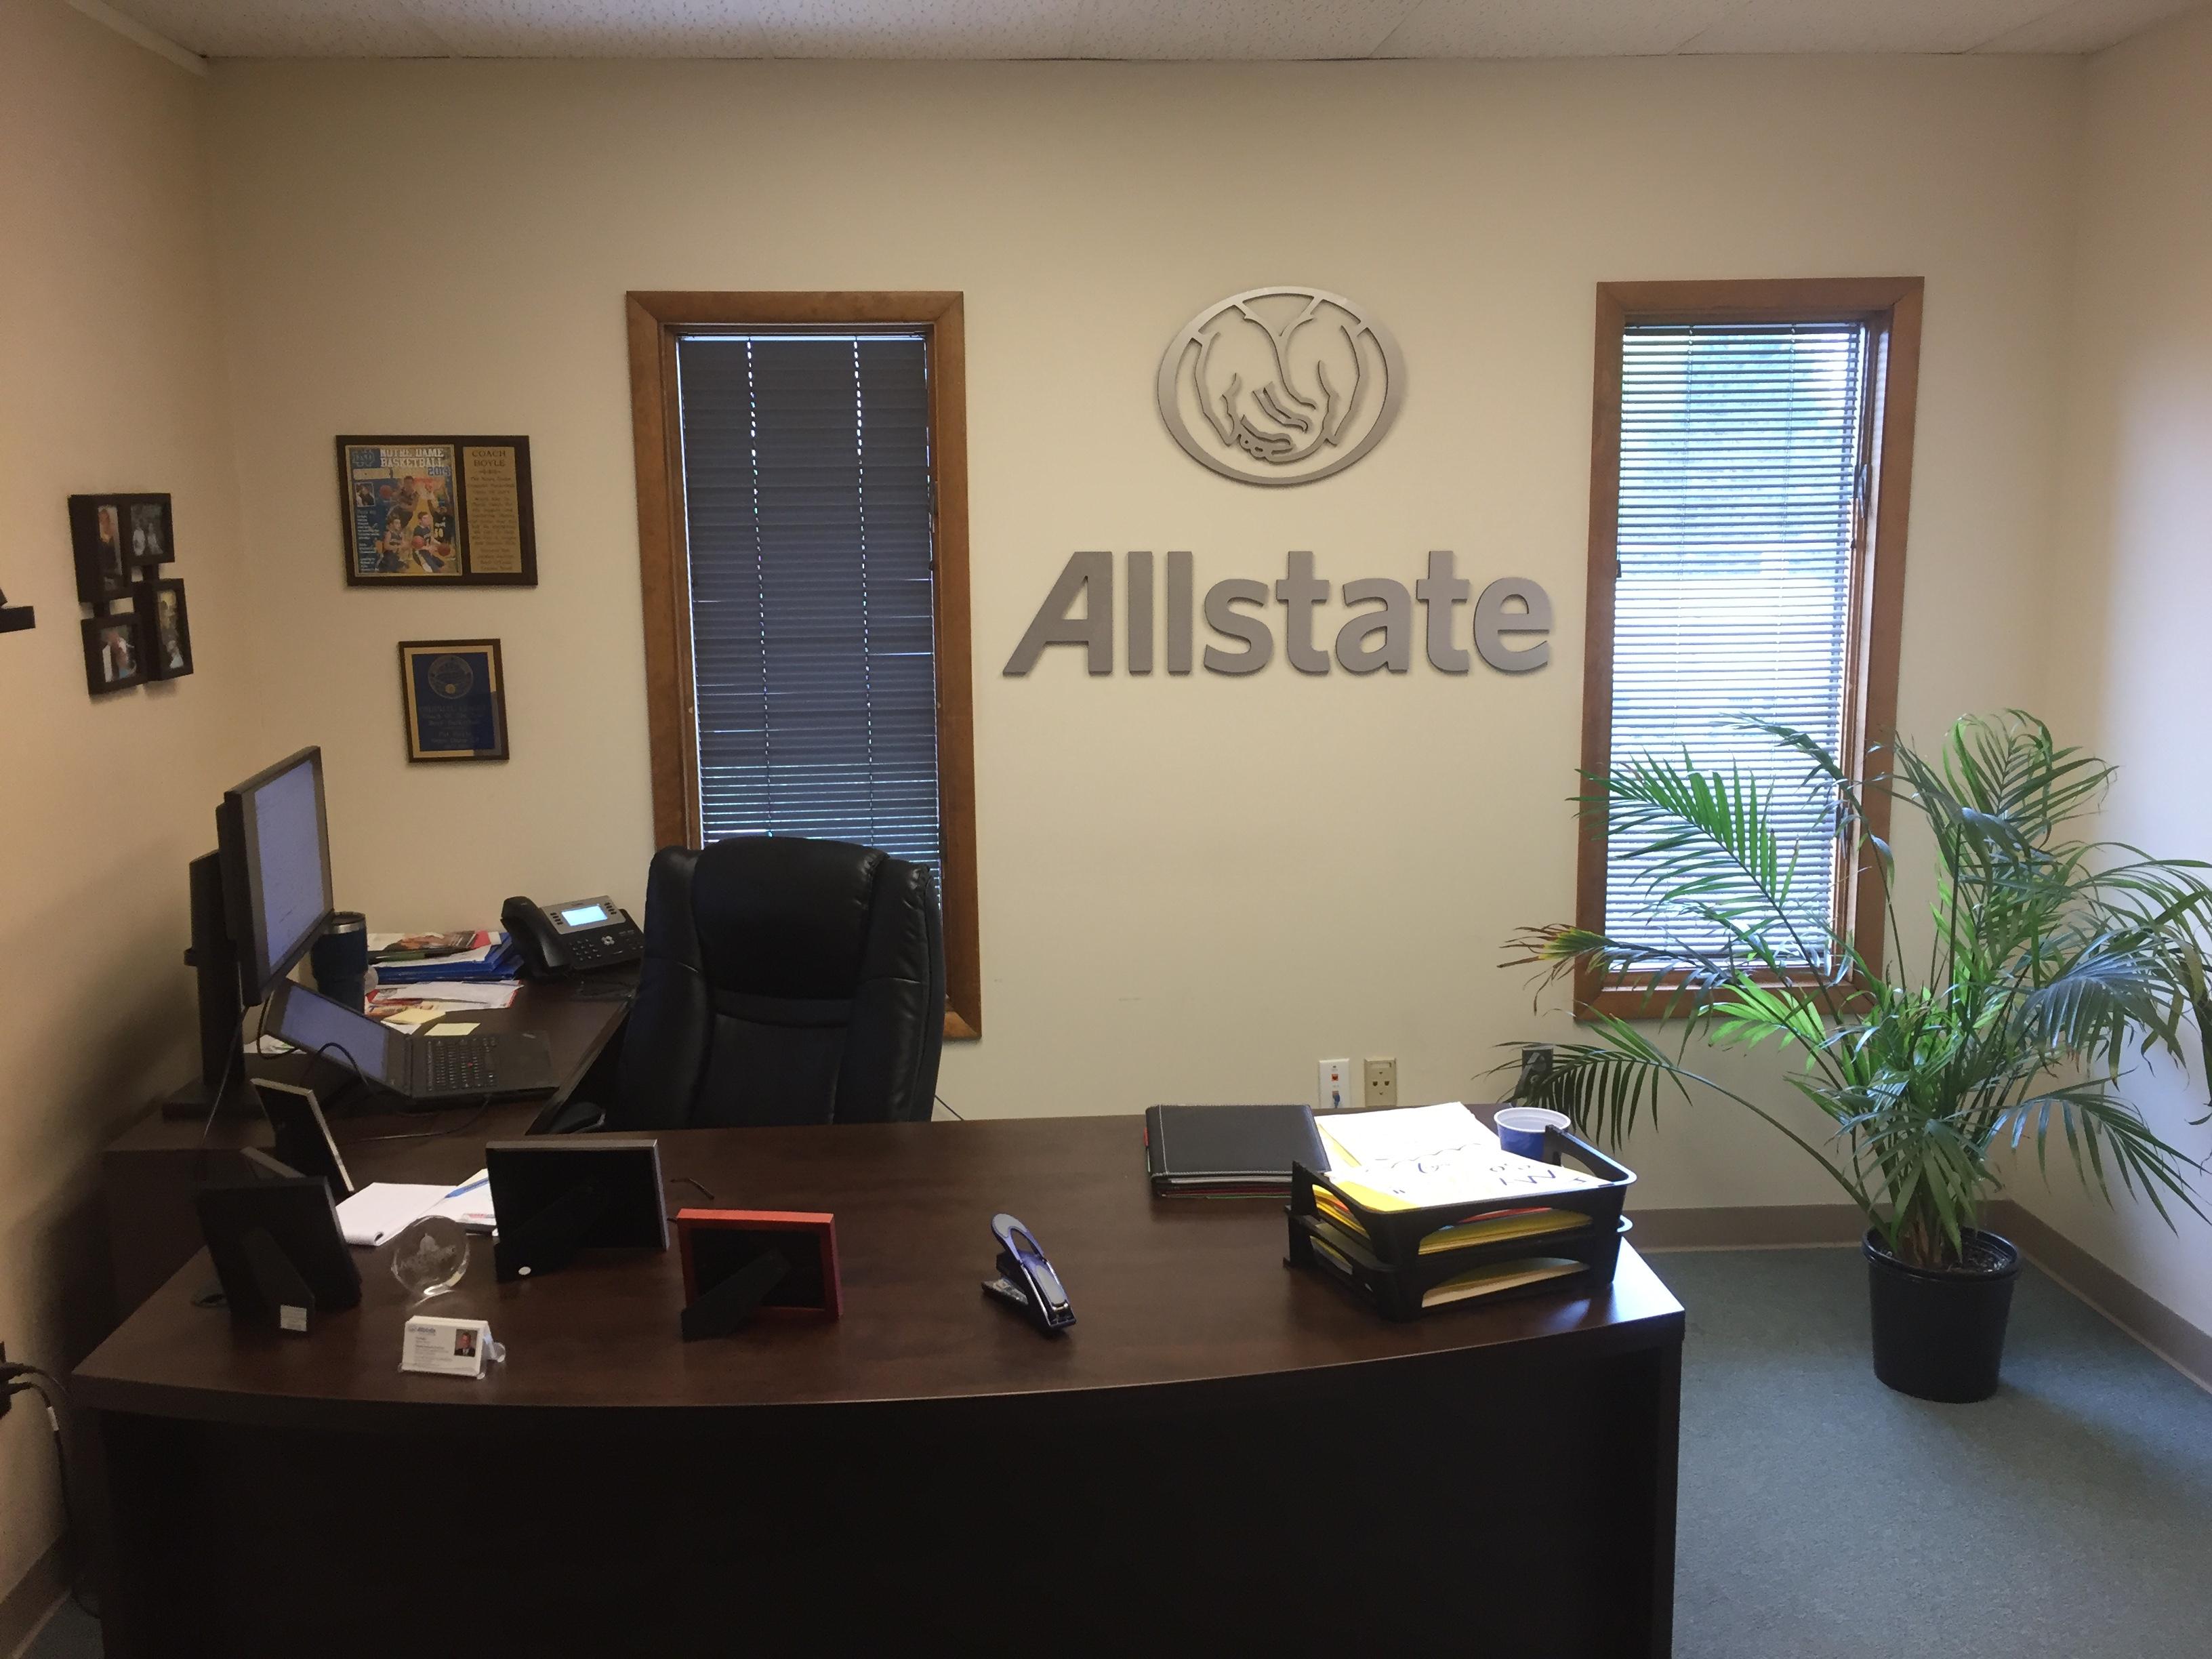 Patrick Boyle: Allstate Insurance image 3